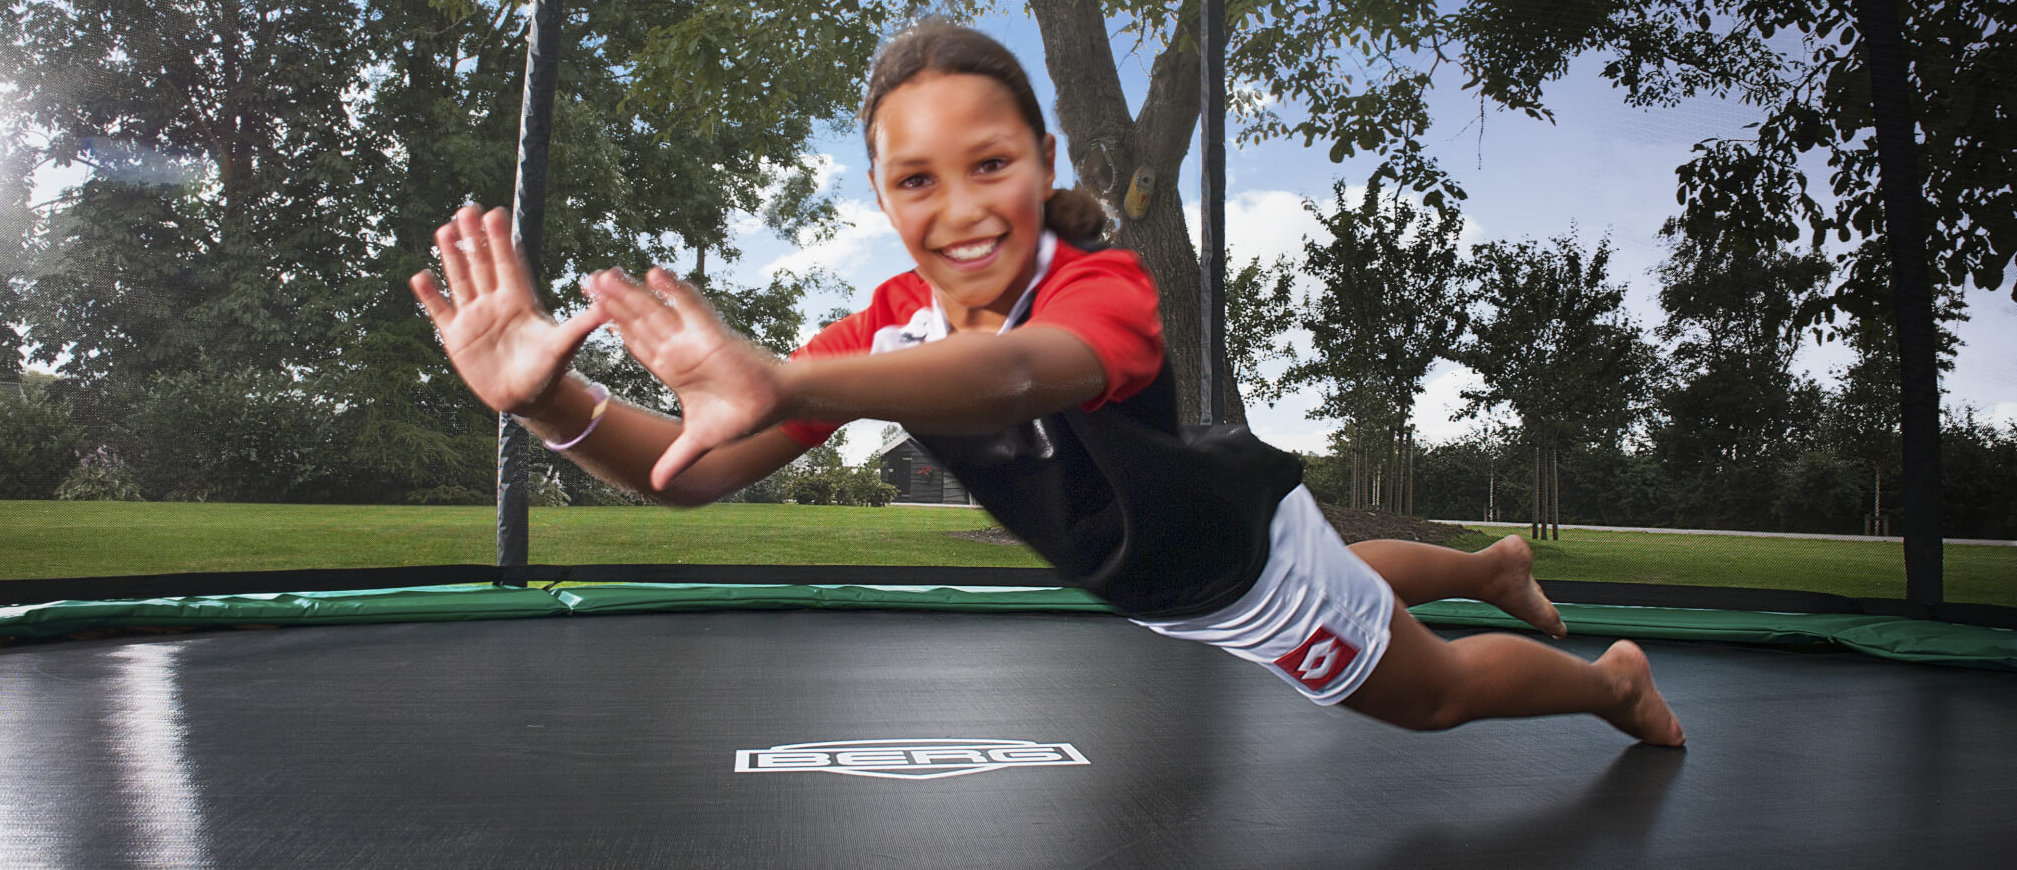 Trampolin macht Kinder sportlich - Ratgeber Trampolin-Profi.de